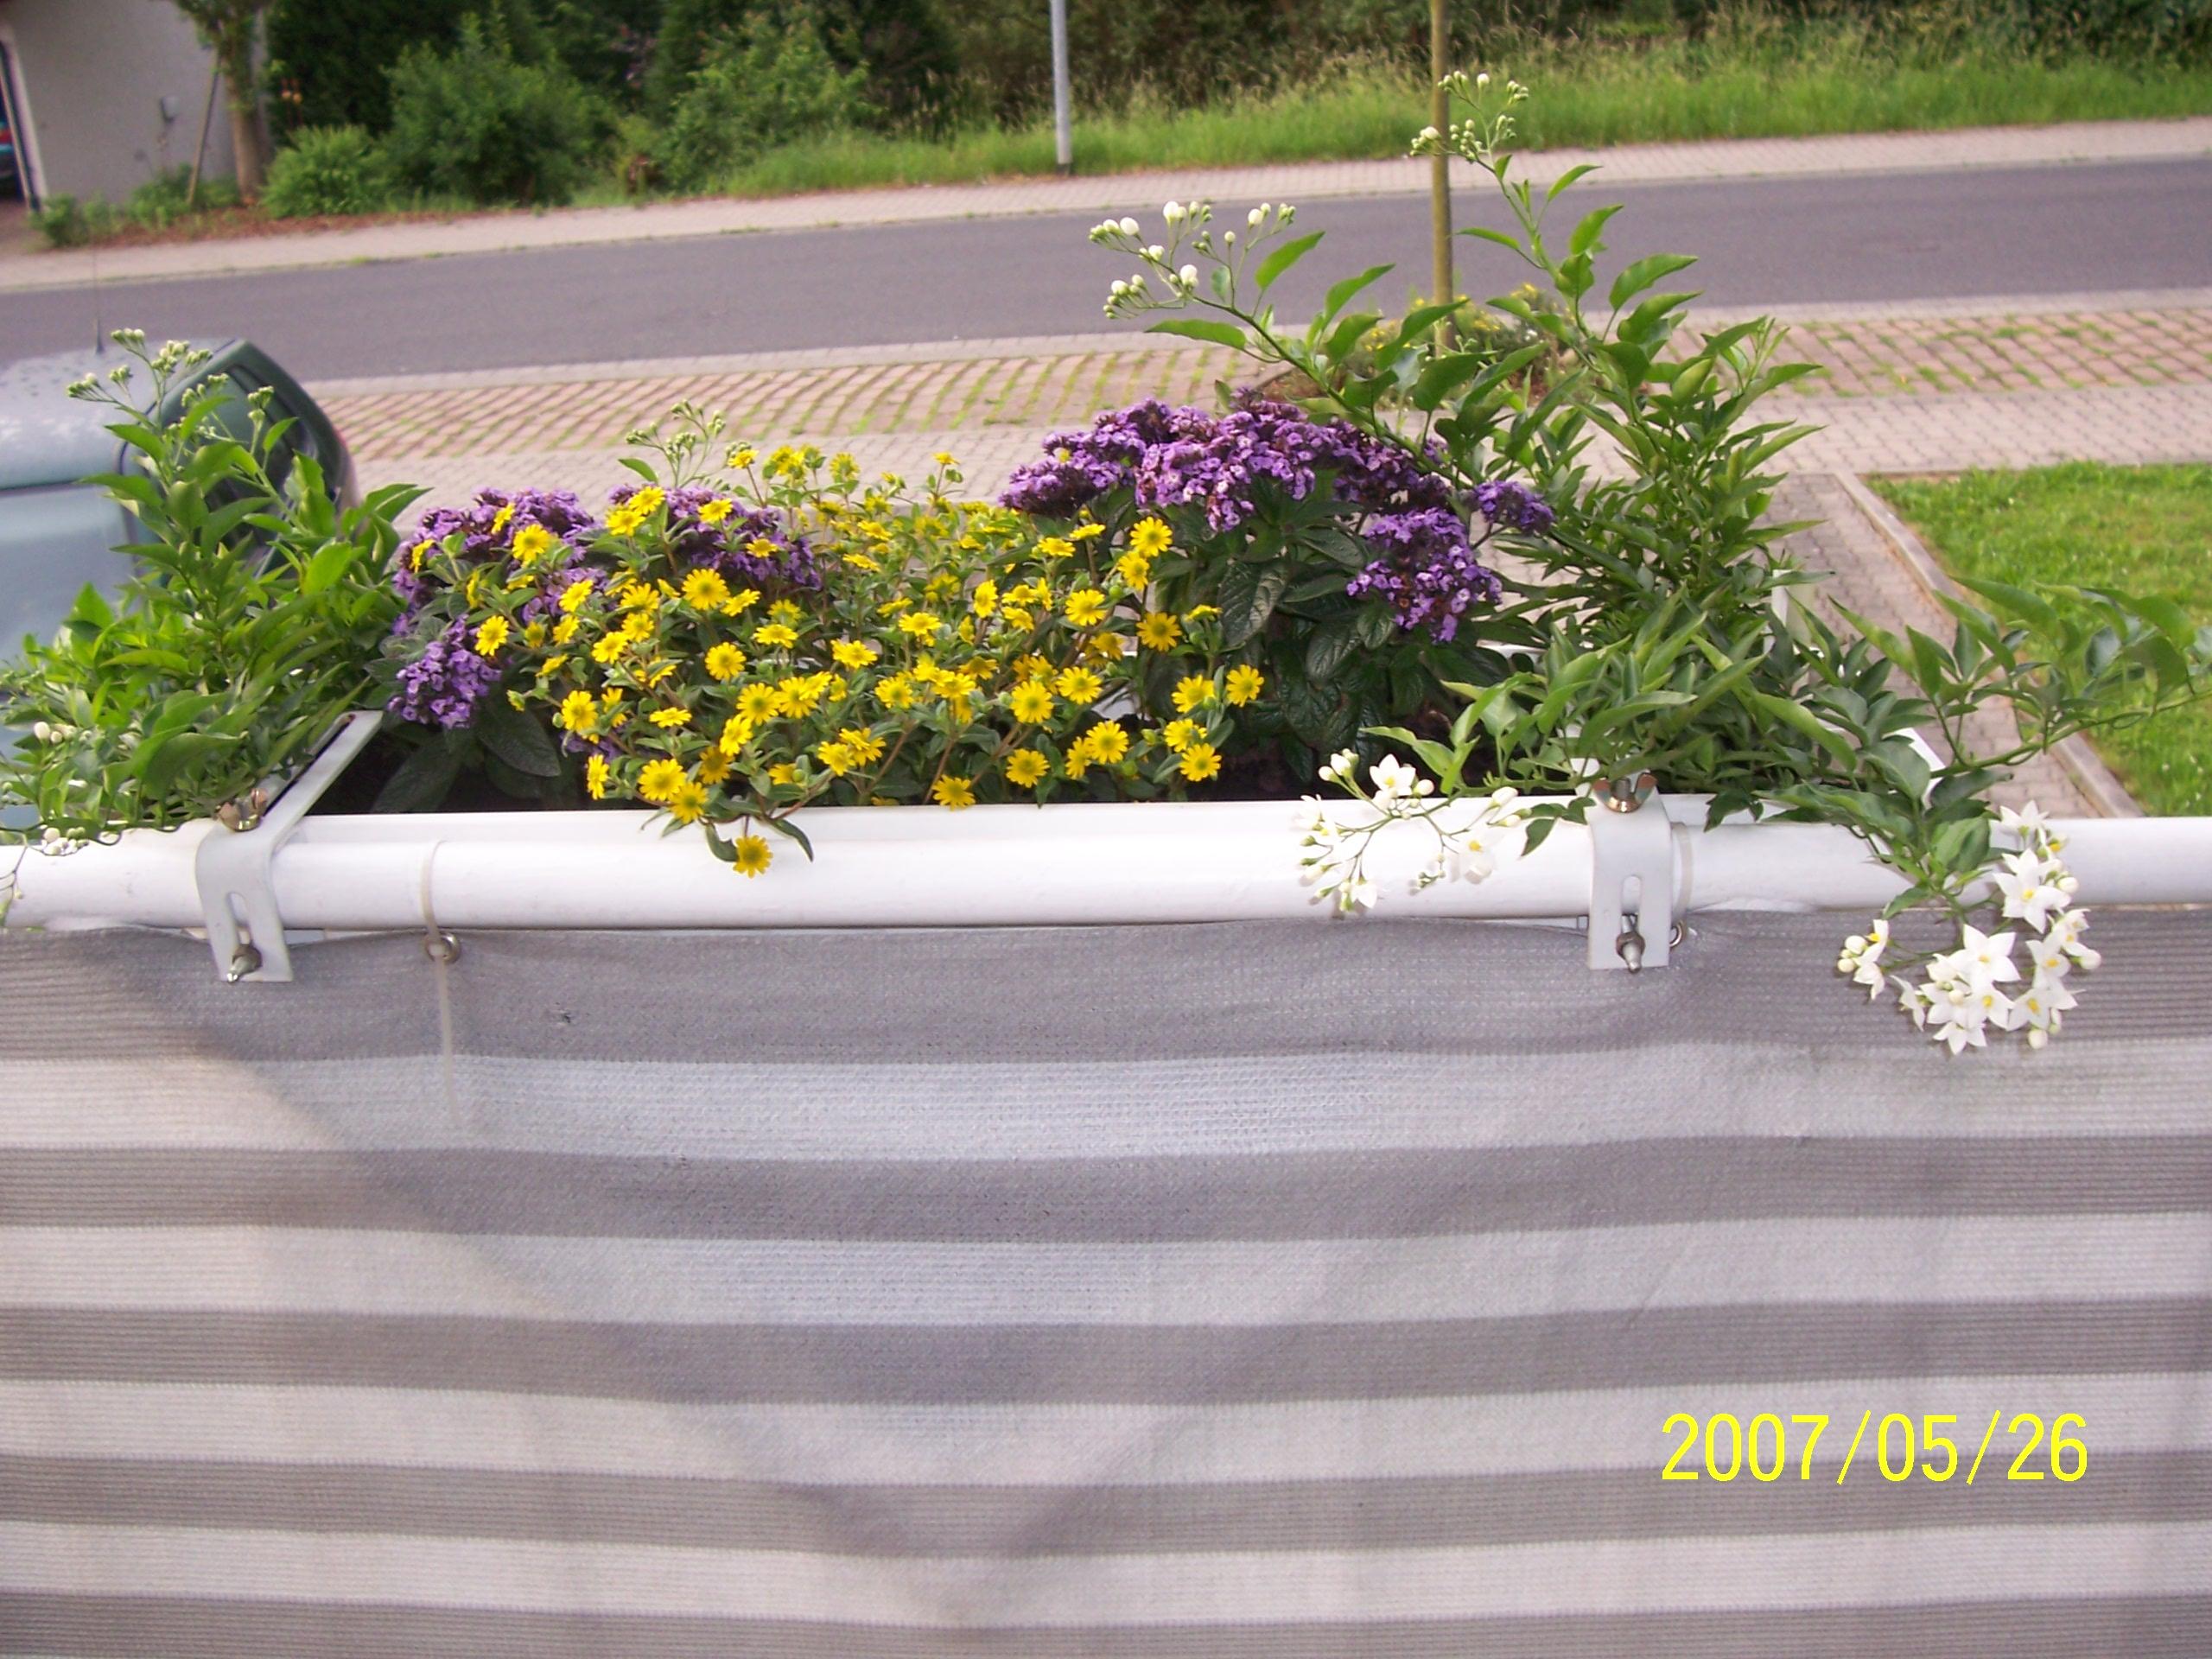 bepflanzung s dbalkon haus garten forum. Black Bedroom Furniture Sets. Home Design Ideas